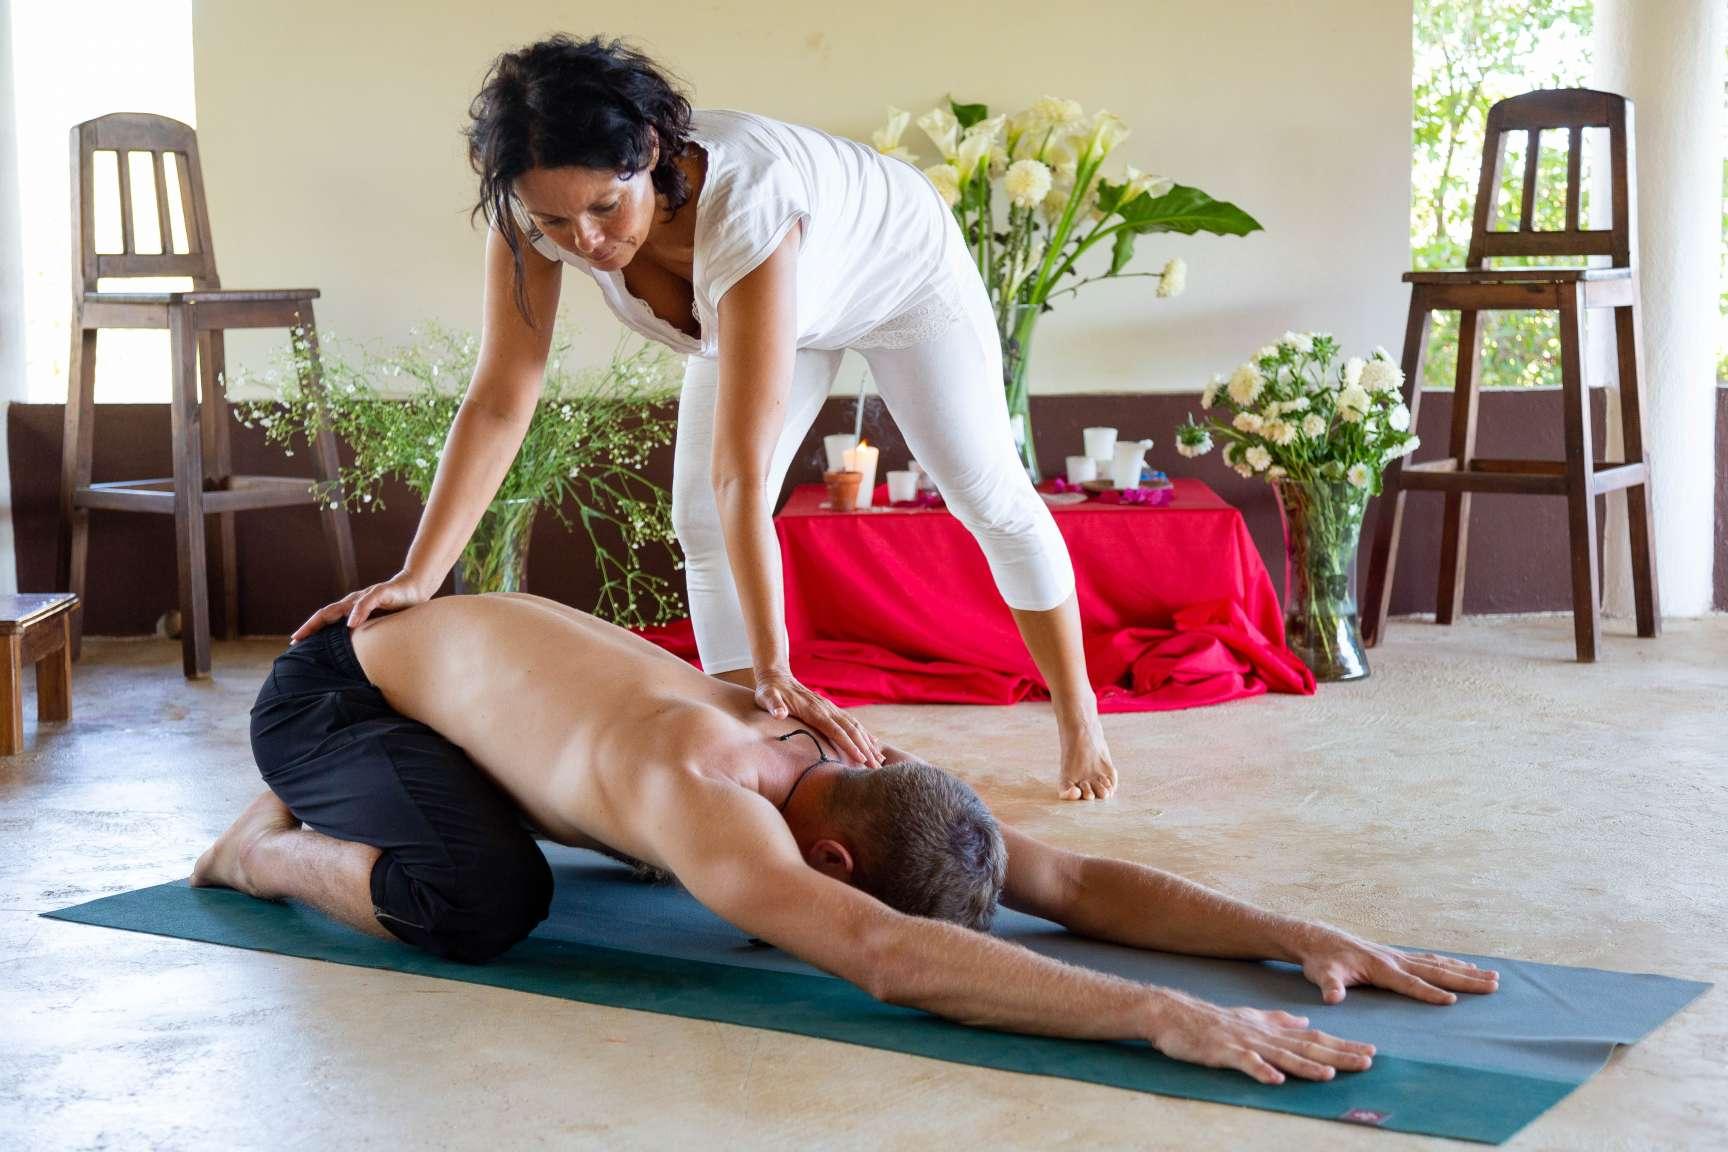 woman yoga teacher assisting man in Balasana